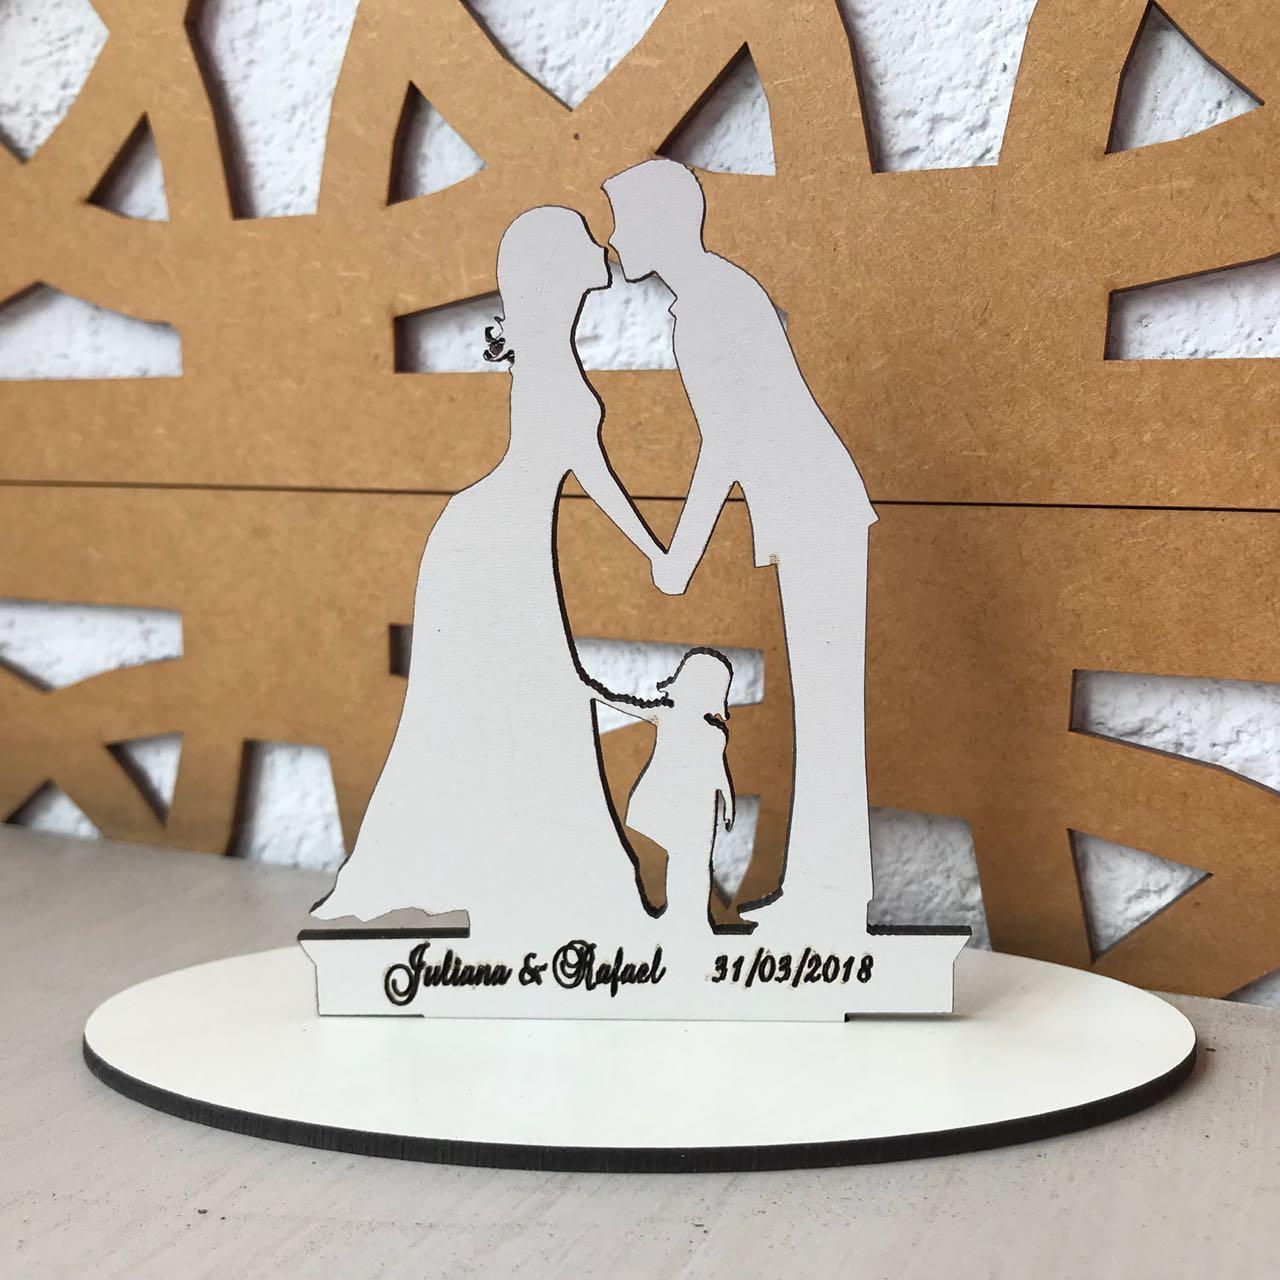 Ref. 008 - Kit Lembrancinhas de Casamento Personalizadas MDF Branco Noivos Menina